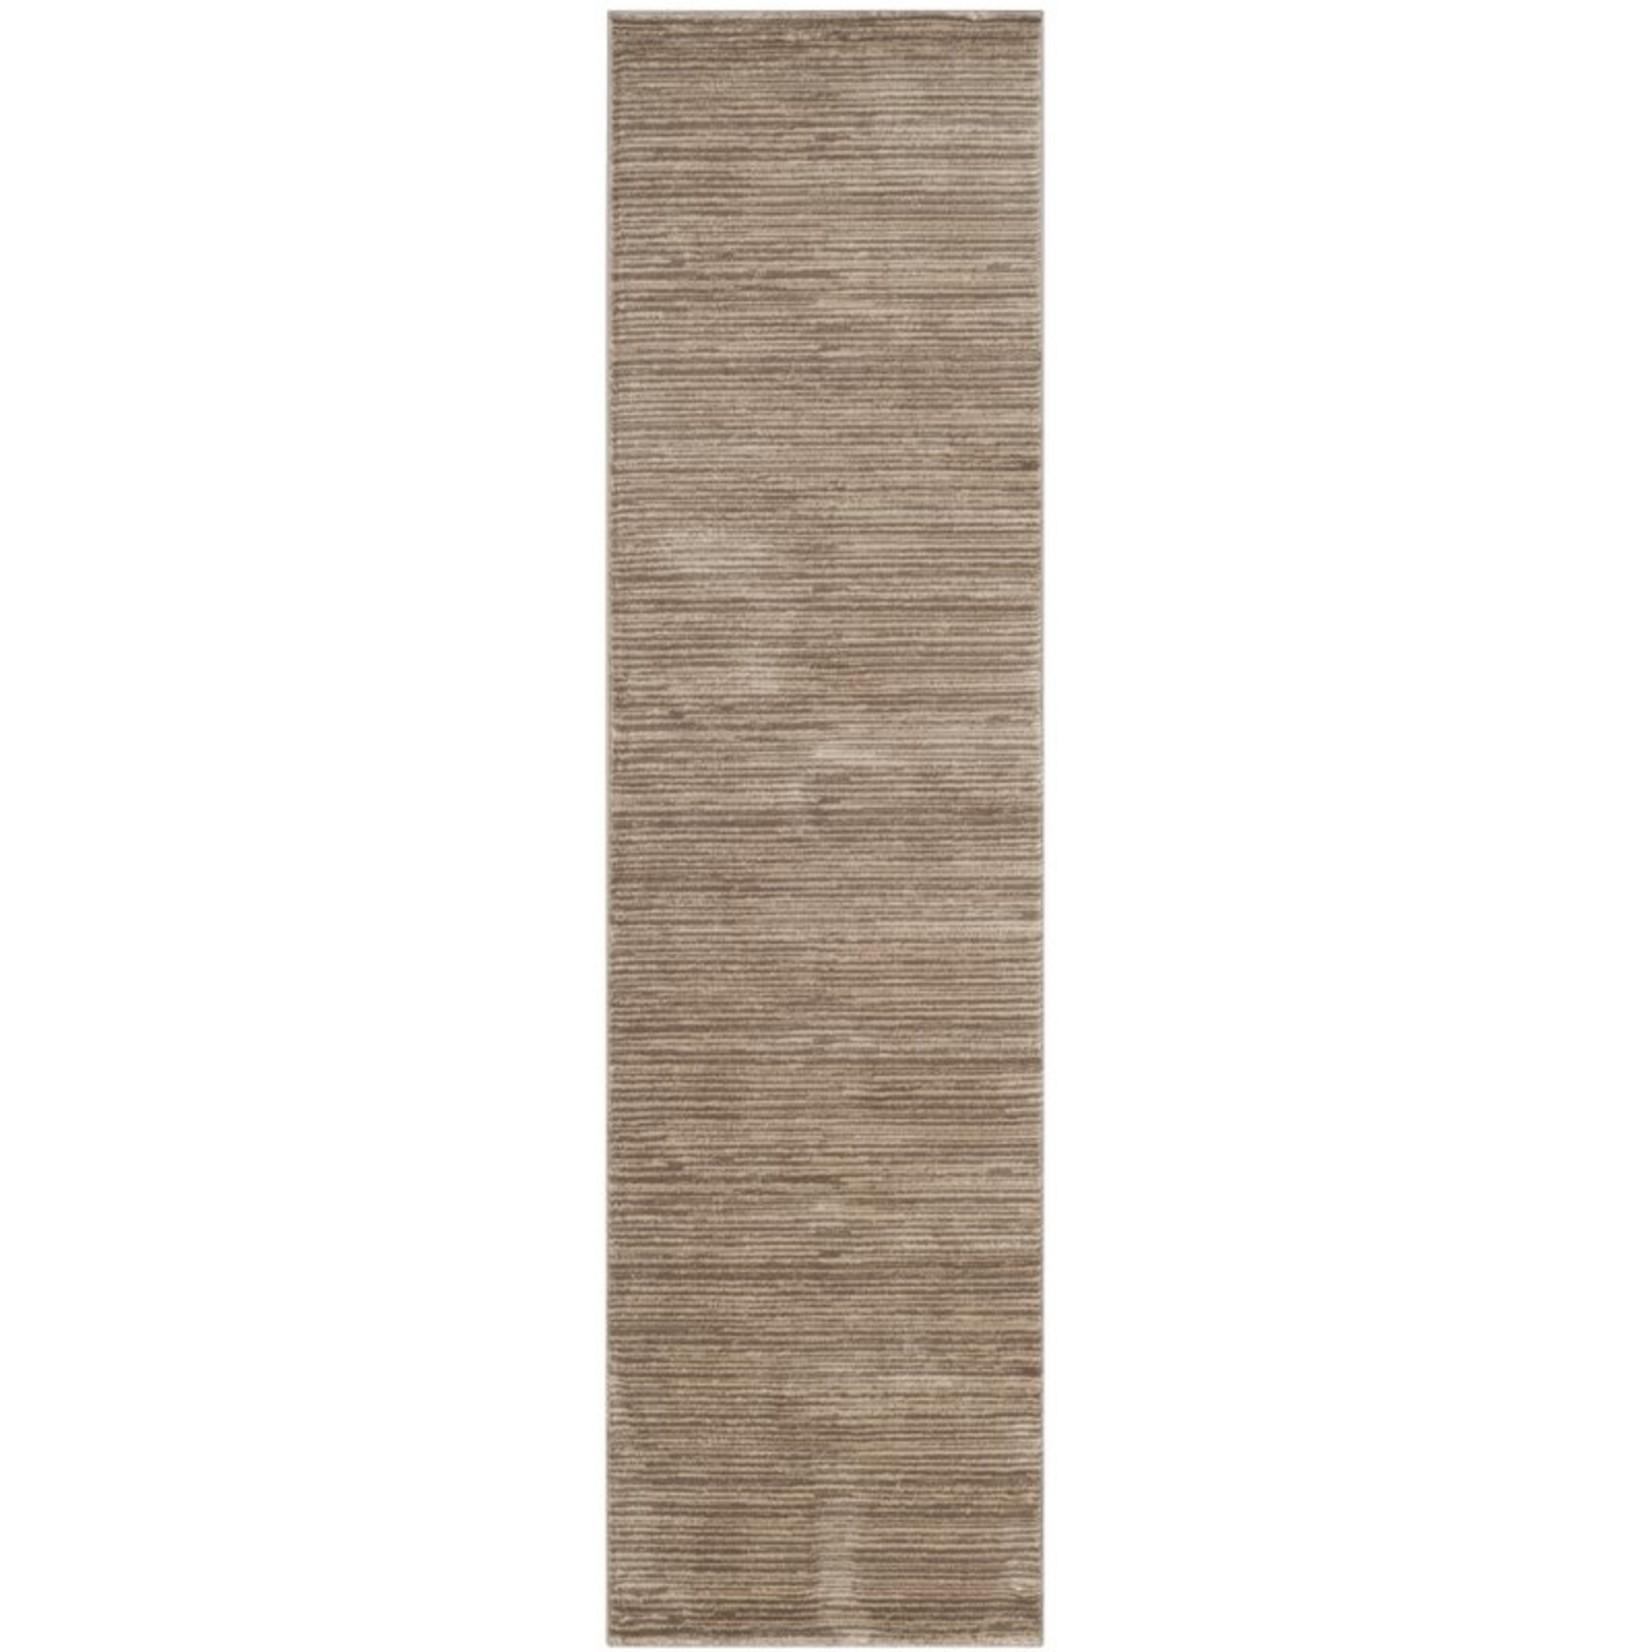 *2'2 x 8' -  Harloe Light Brown Area Rug